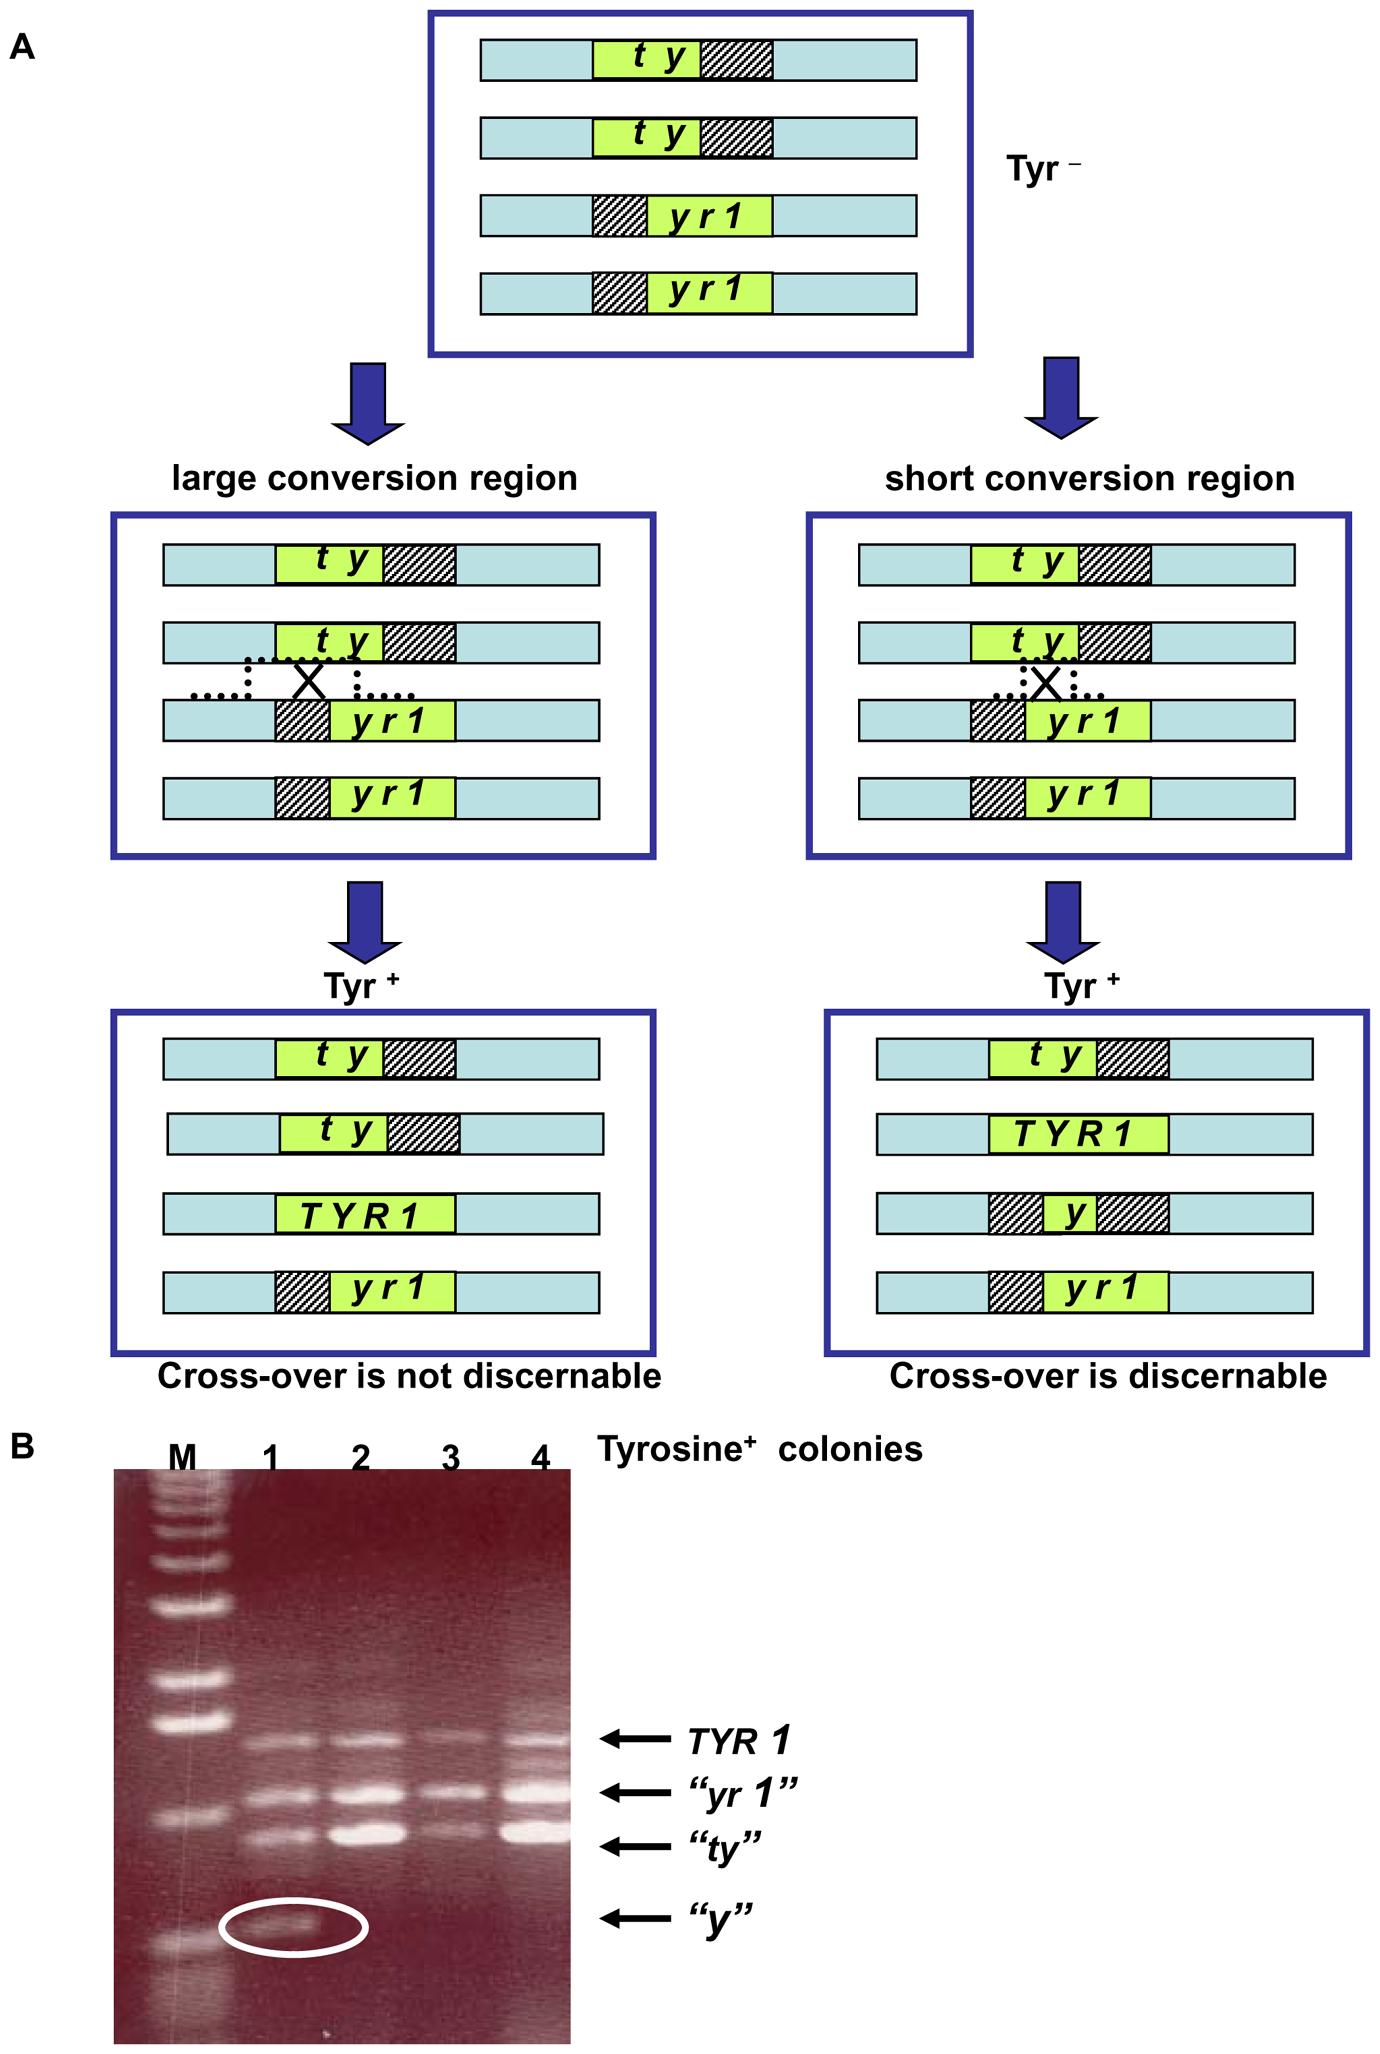 Genetic reporter for recombination between heteroalles residing on homologous chromosomes in tetraploid strains.